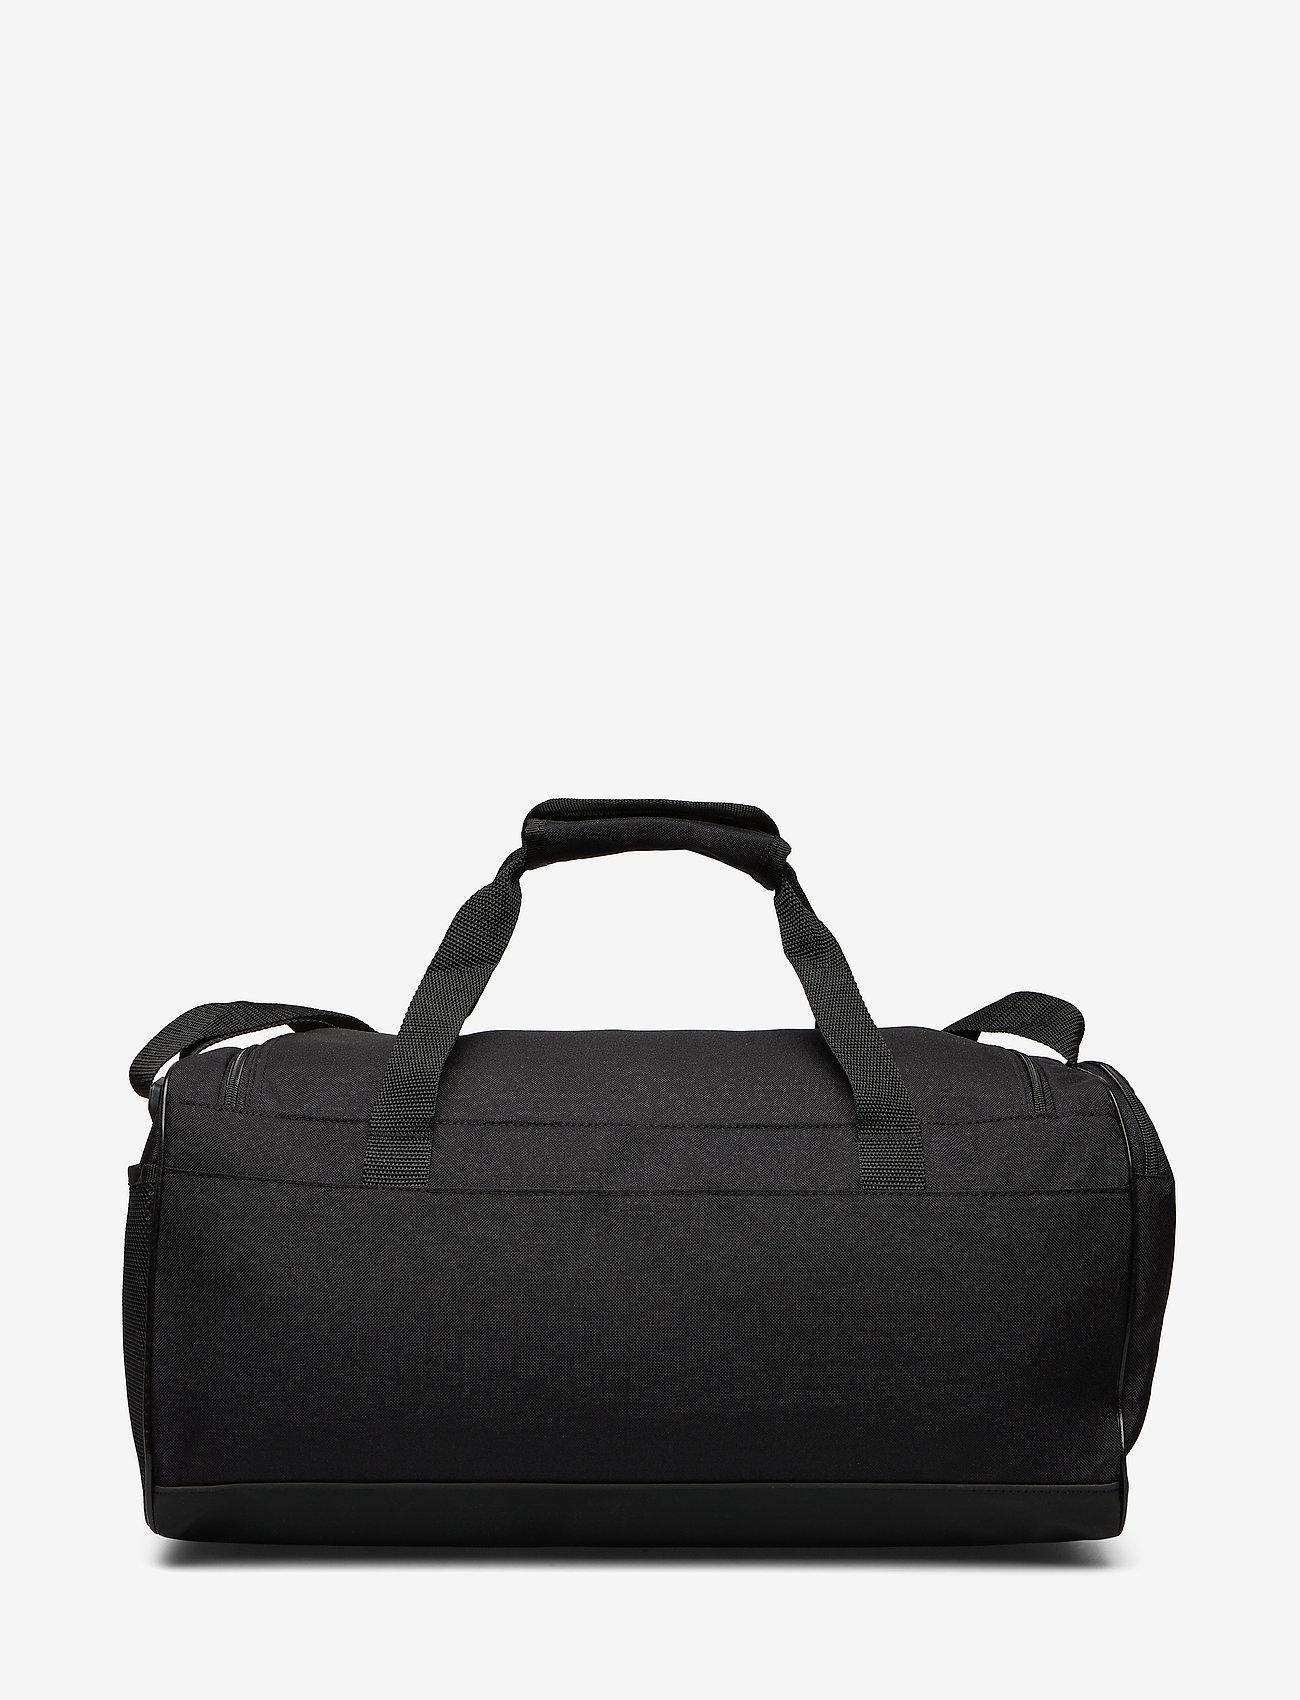 adidas Performance - LIN DUFFLE S - sports bags - black/black/white - 1